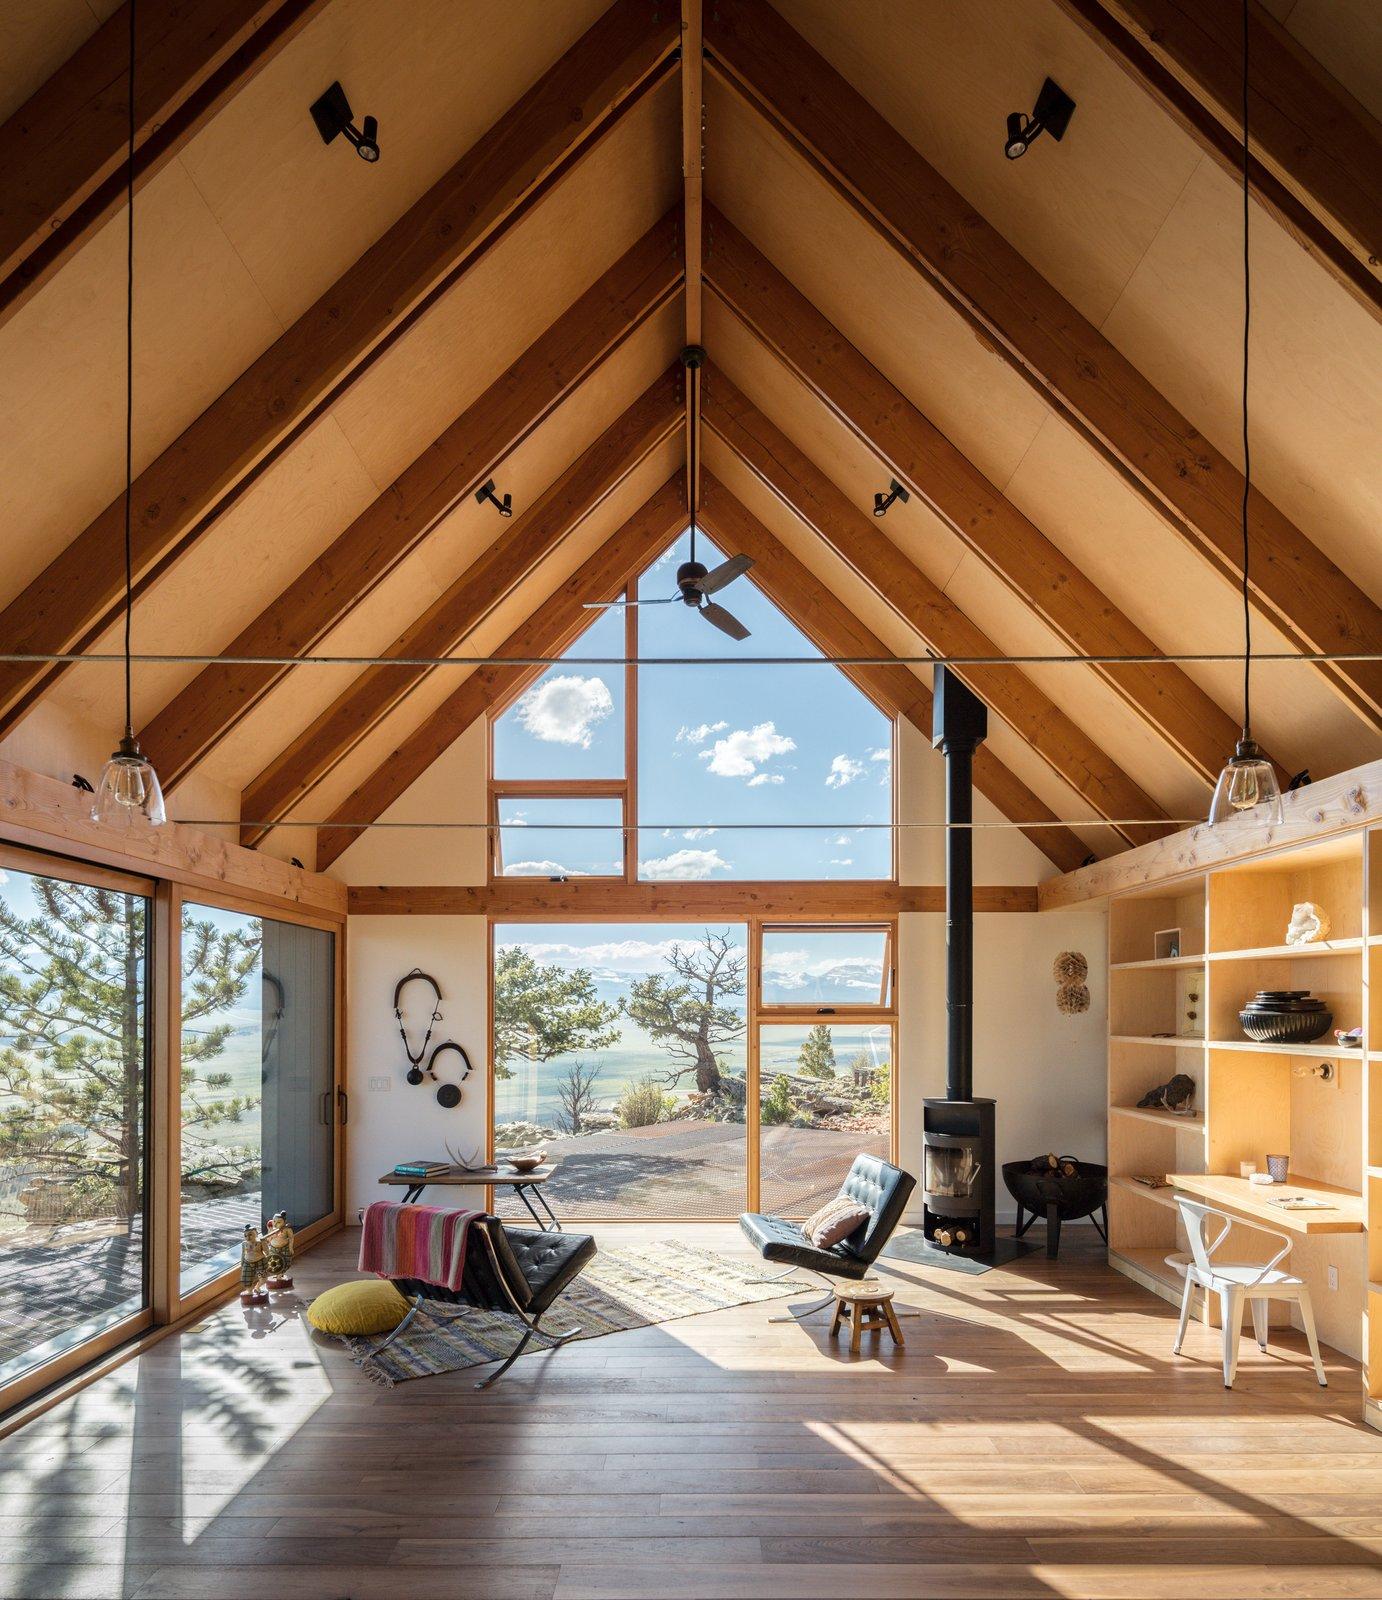 Big Cabin Little Cabin interior